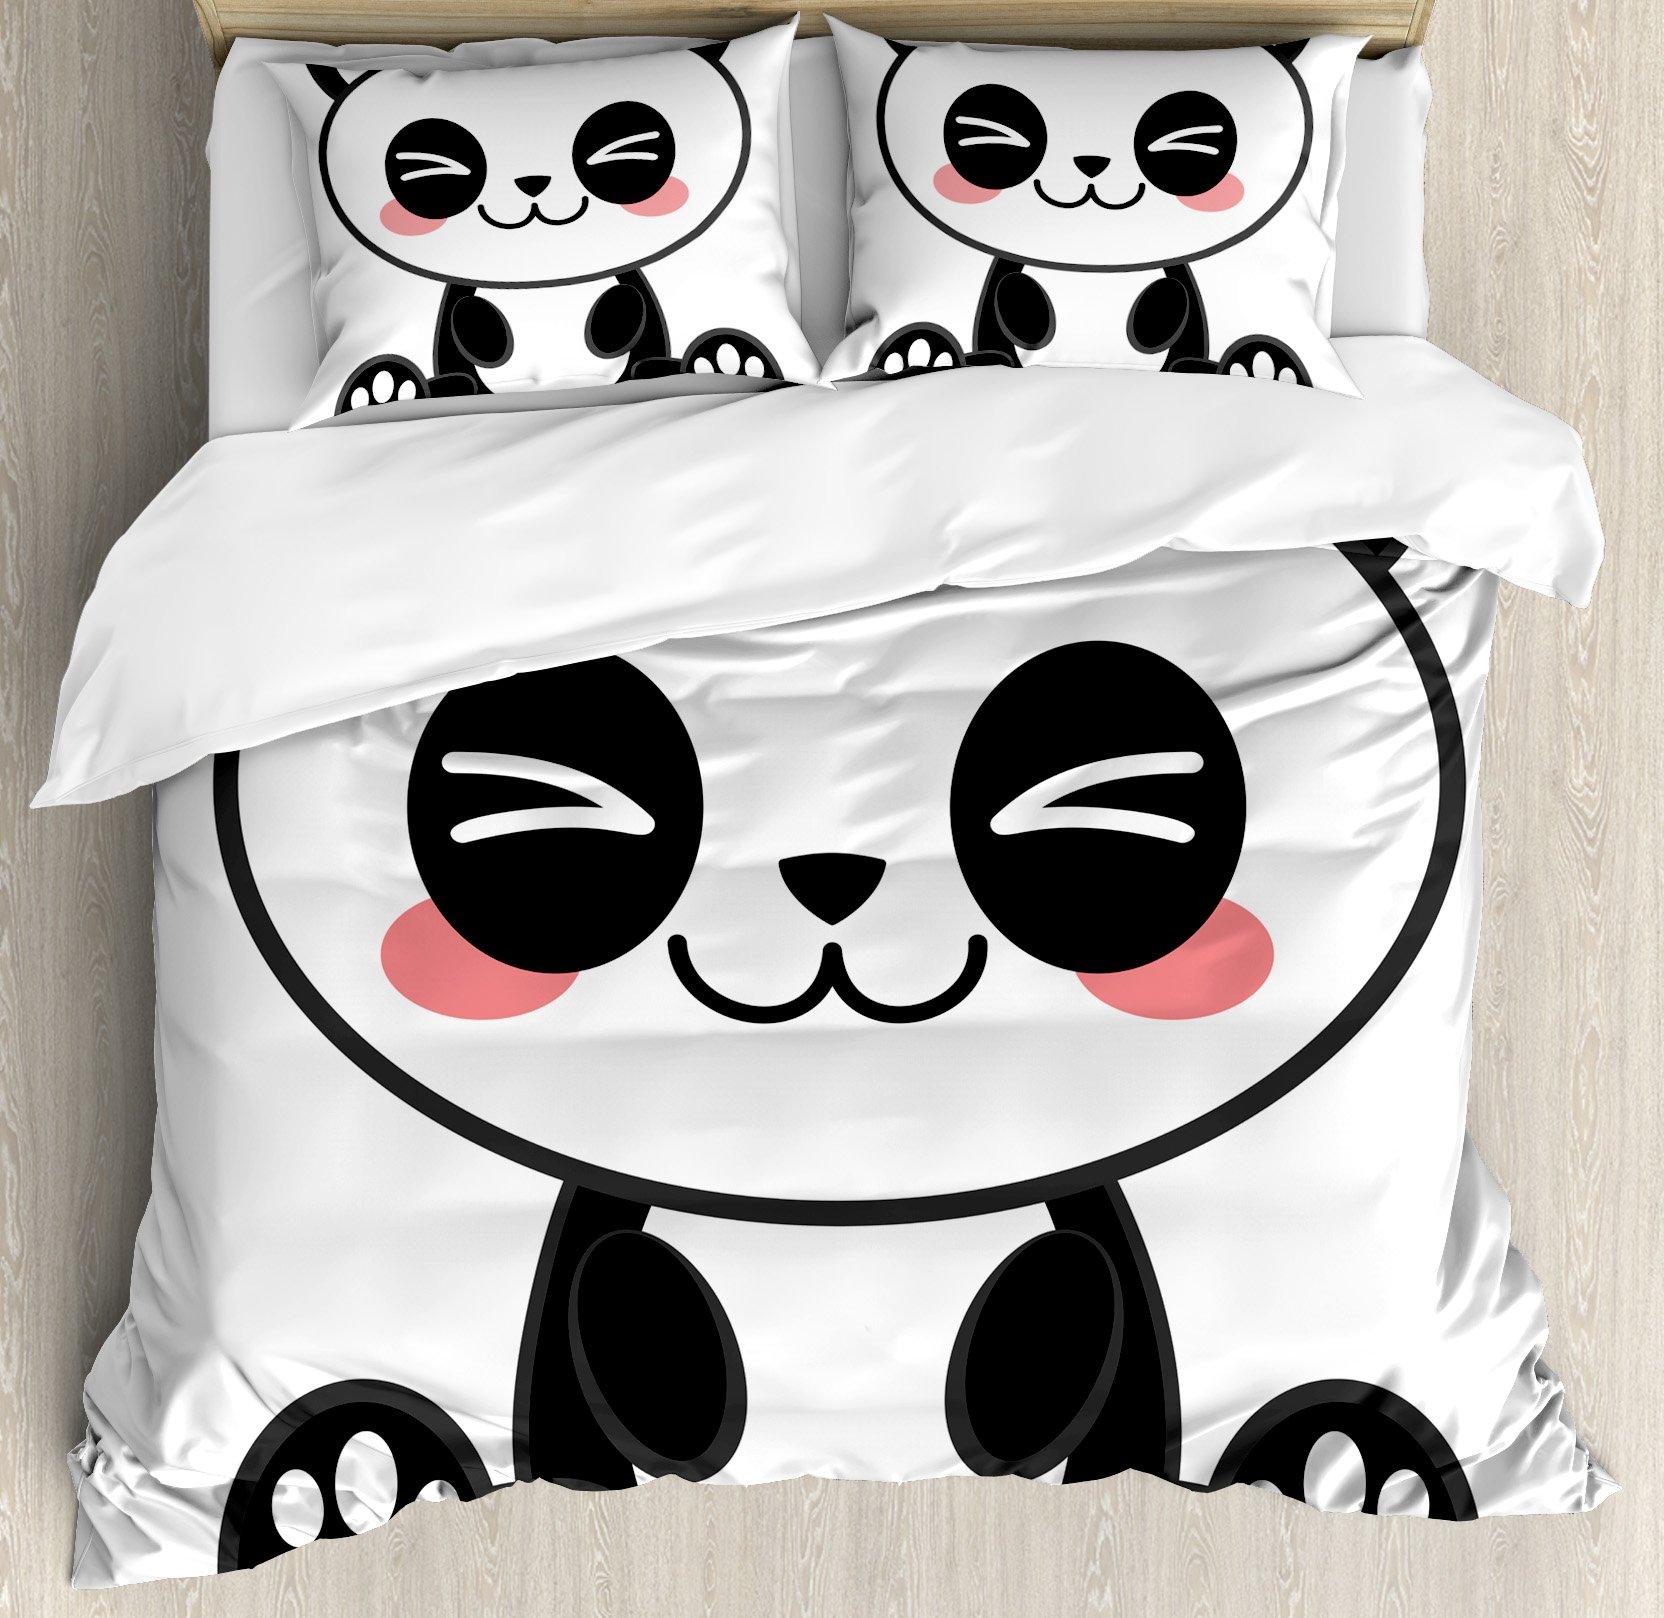 Anime Duvet Cover Set by Ambesonne, Cute Cartoon Smiling Panda Fun Animal Theme Japanese Manga Kids Teen Art Print, 3 Piece Bedding Set with Pillow Shams, Queen / Full, Black White Gray